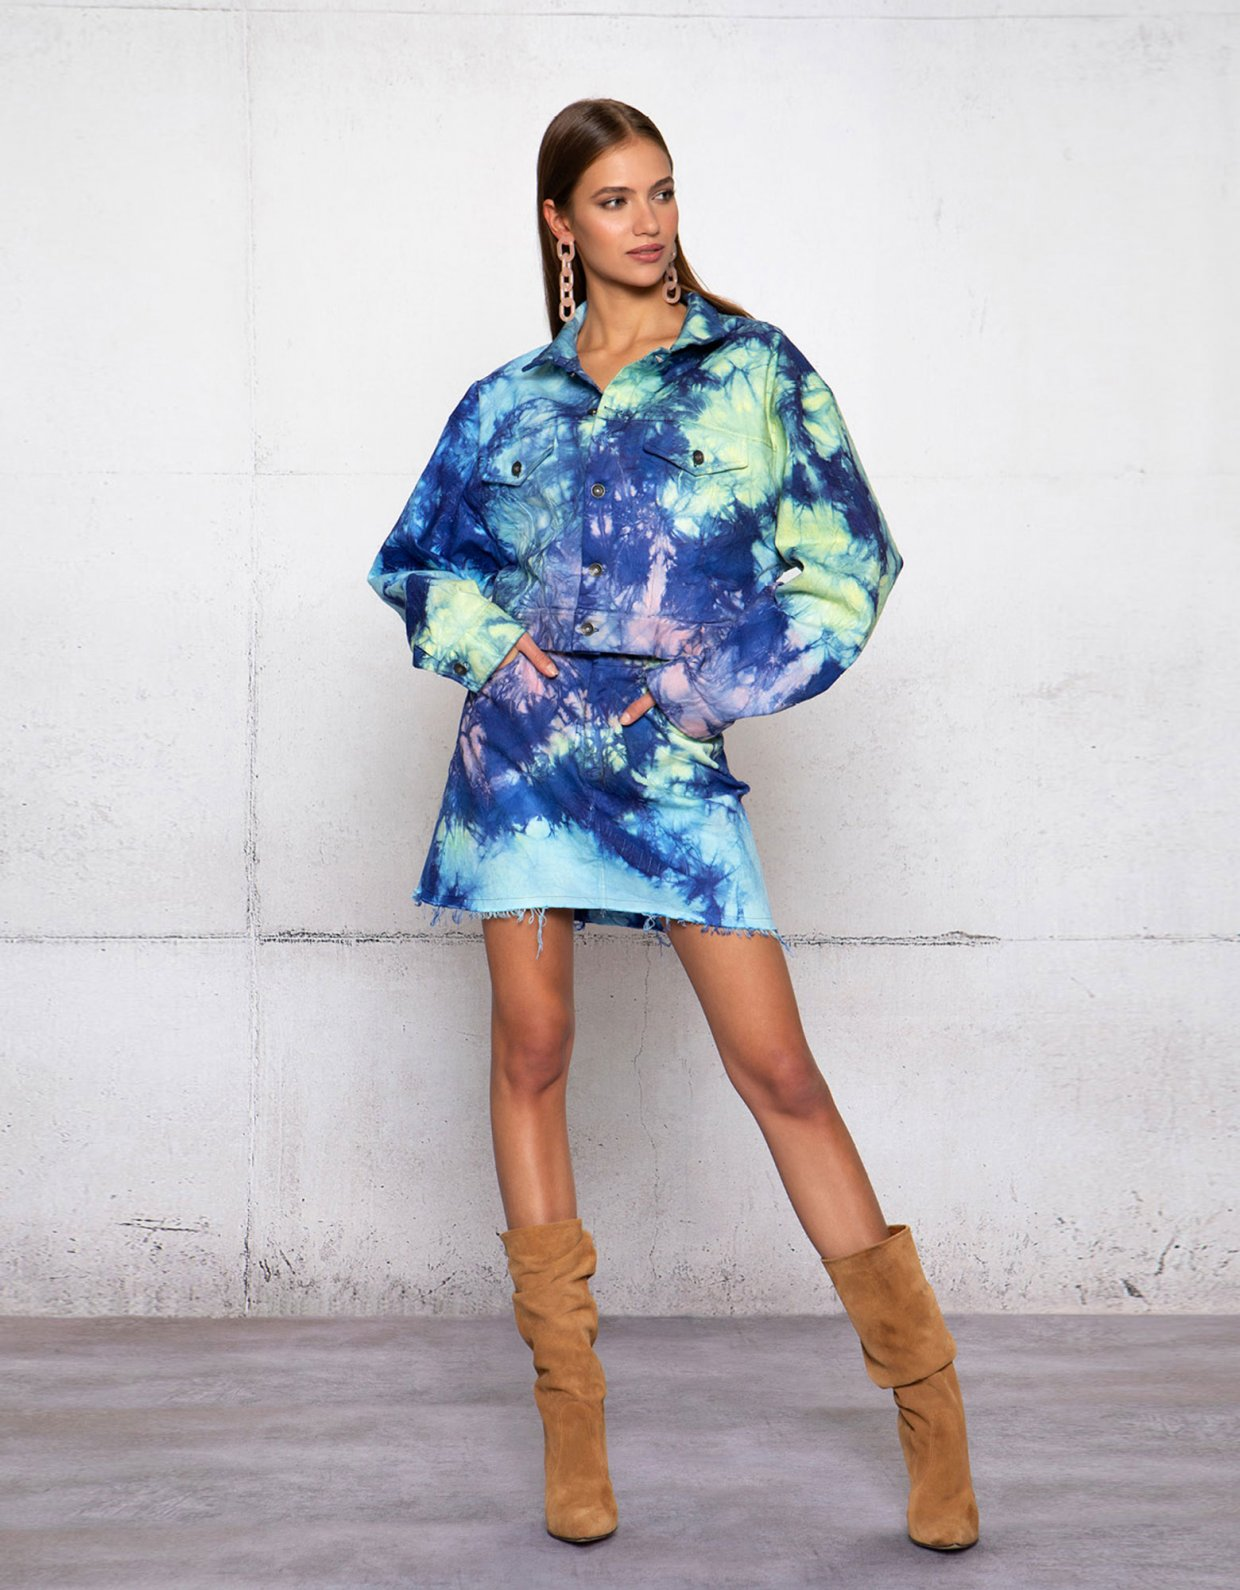 Peace & Chaos Ocean dance tie dye denim skirt